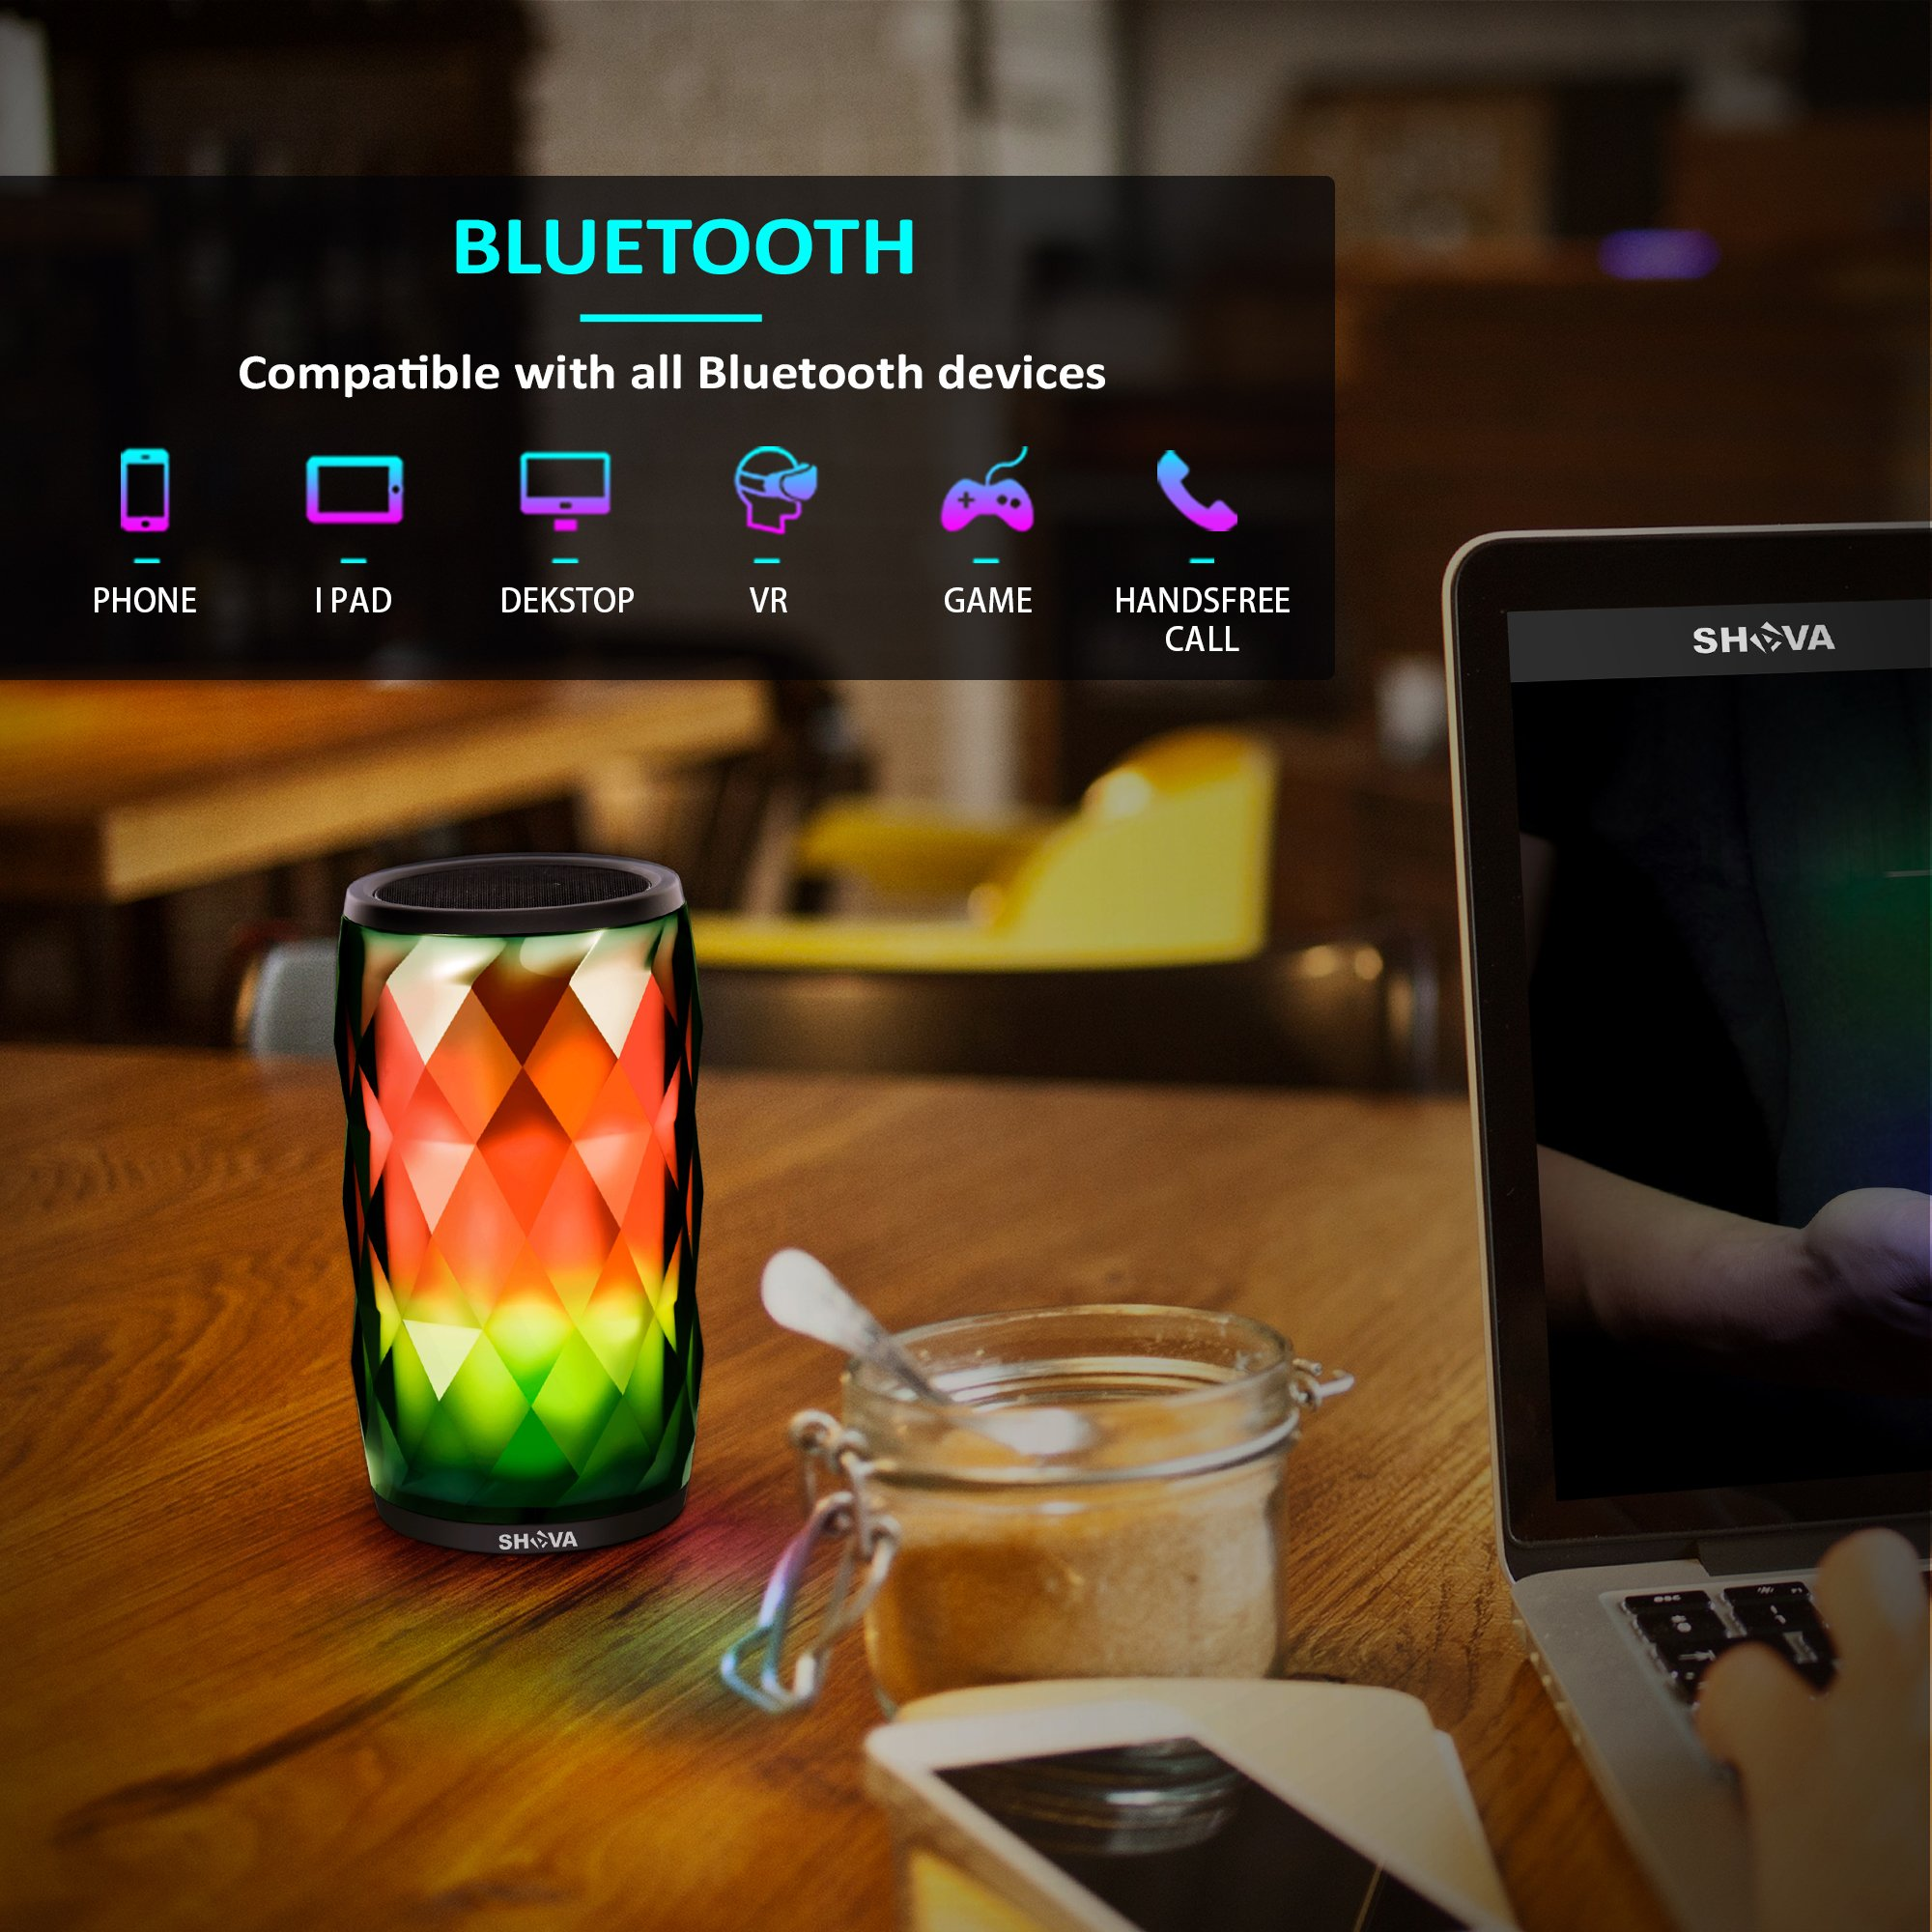 Night Light Bluetooth Speaker, SHAVA Jewel Portable Wireless Bluetooth Speaker Touch Control RGB Speaker 6 Color LED Themes Bedside Table Lamp, Speakerphone/PC/